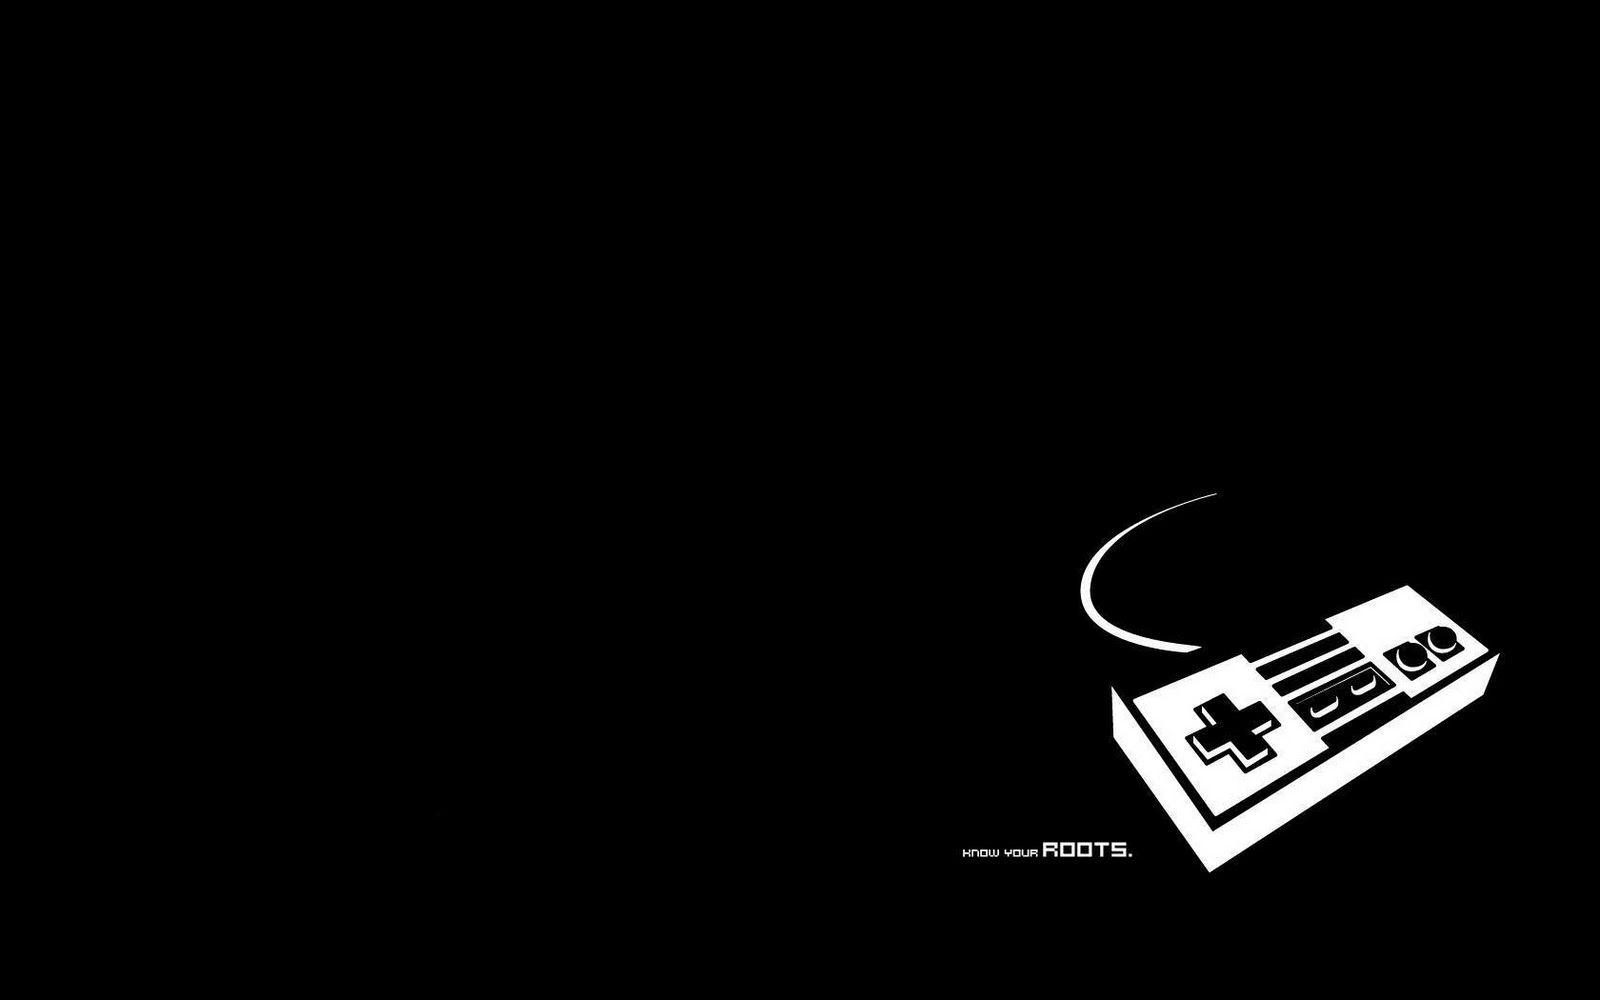 Video Game Wallpapers Classic Desktop In 2019 Retro Video